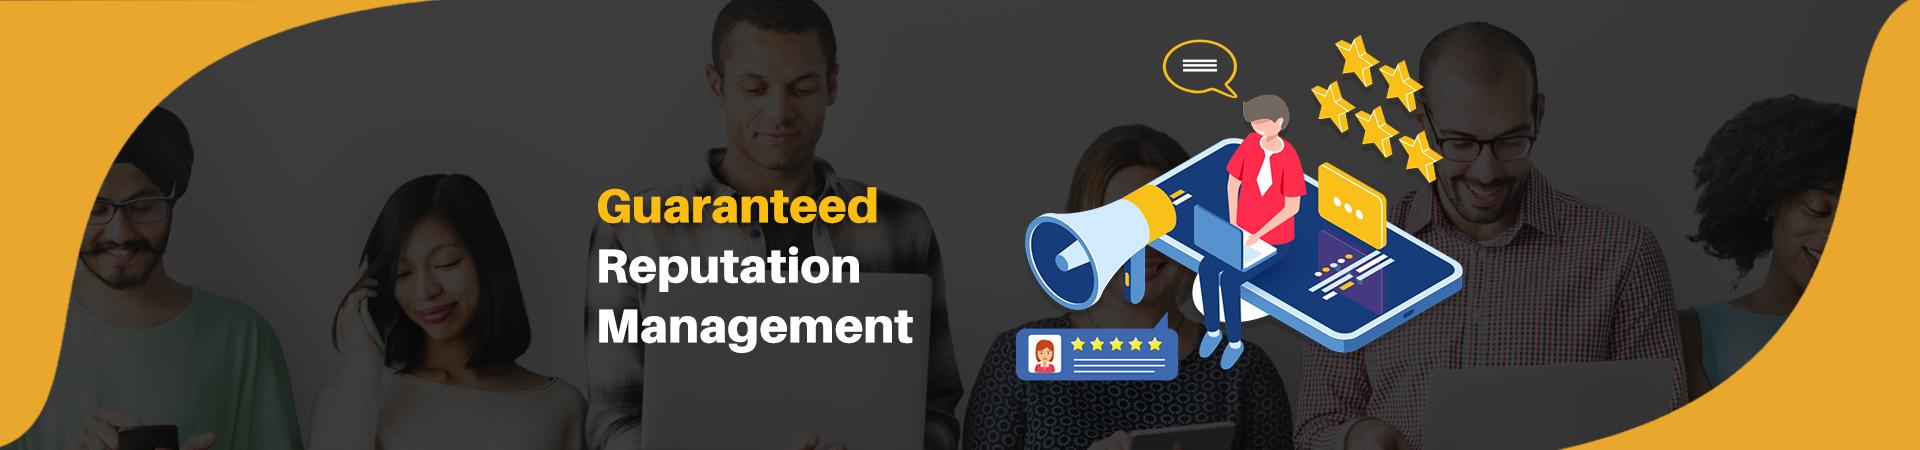 Guaranteed Reputation Management services